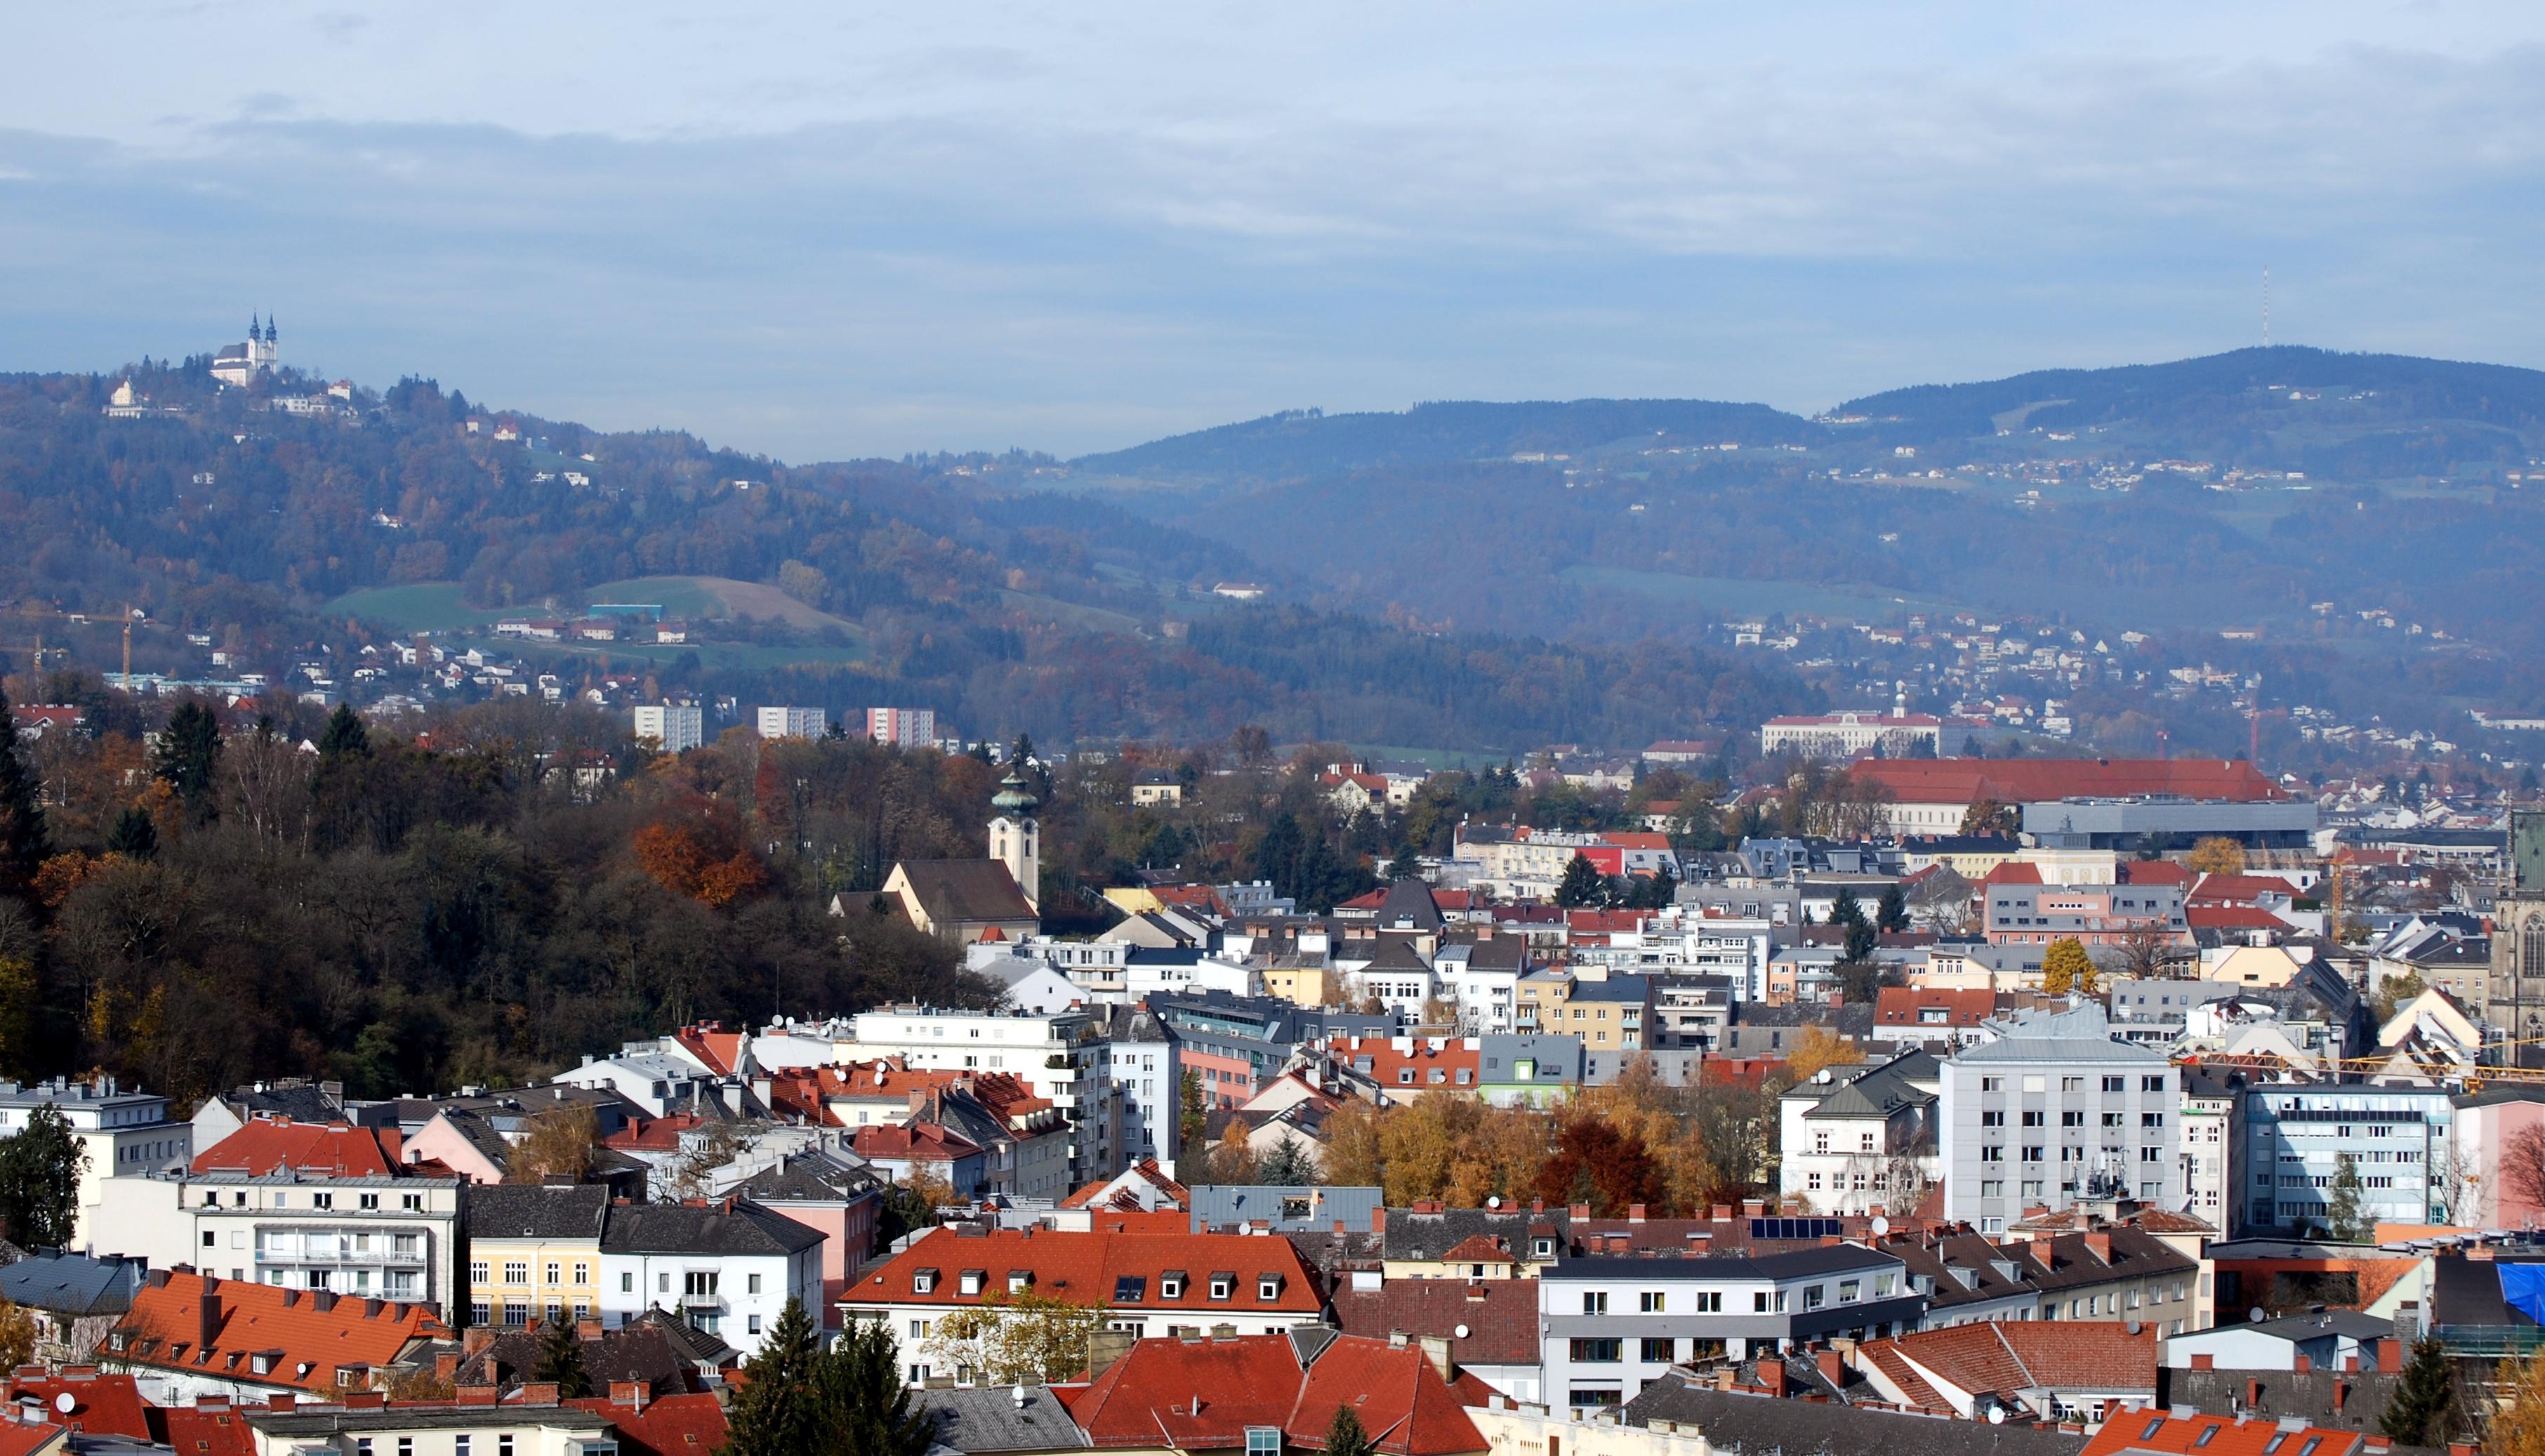 Linz am Rhein – Wikipedia